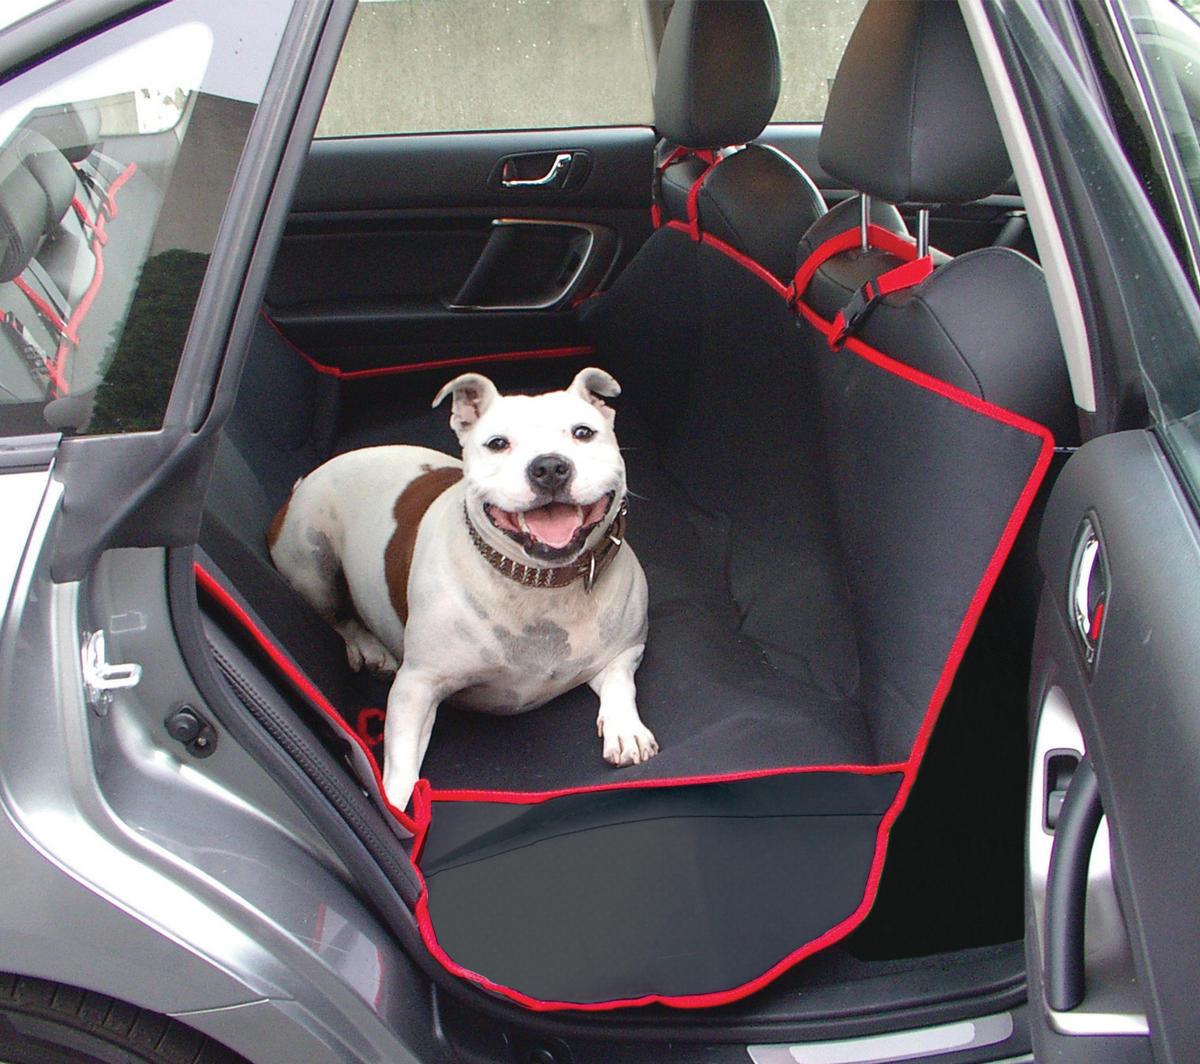 Streetwize SWPC5 Automotive Car Pet Rear Seat Protection Cover Single